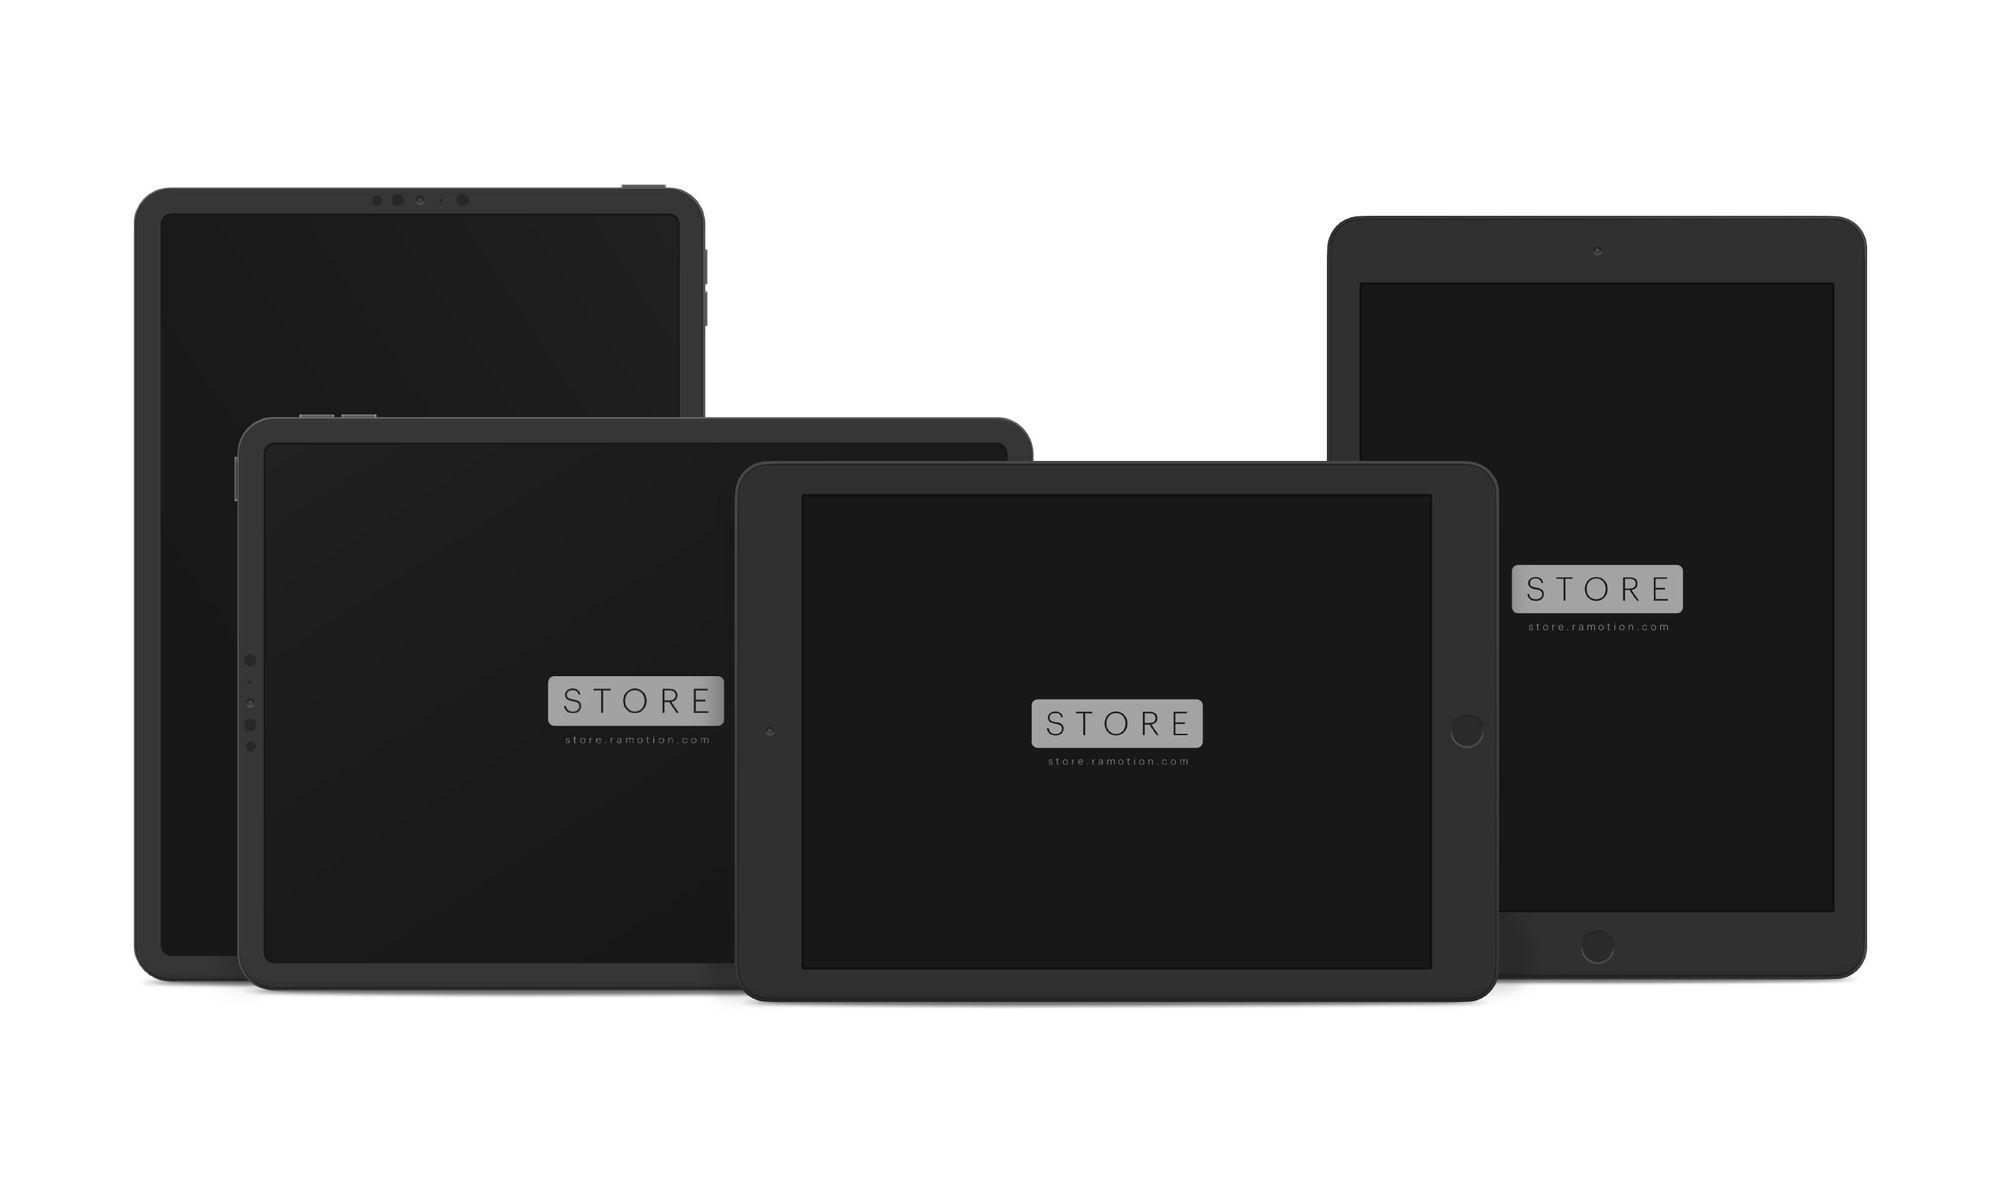 black ipad mockups